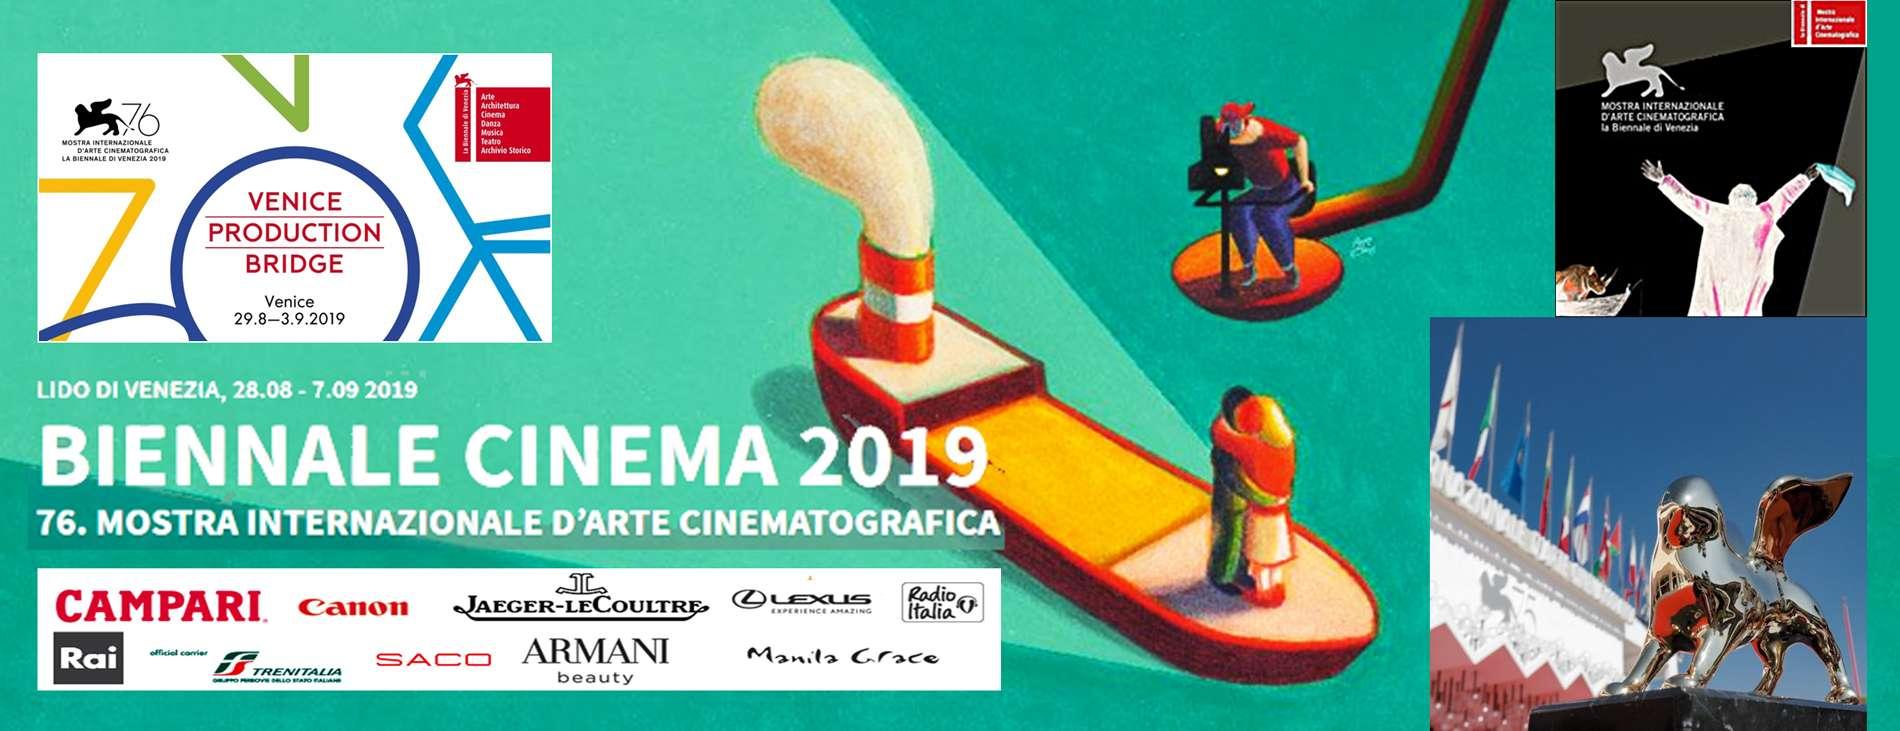 76o Φεστιβάλ Κινηματογράφου της Βενετίας